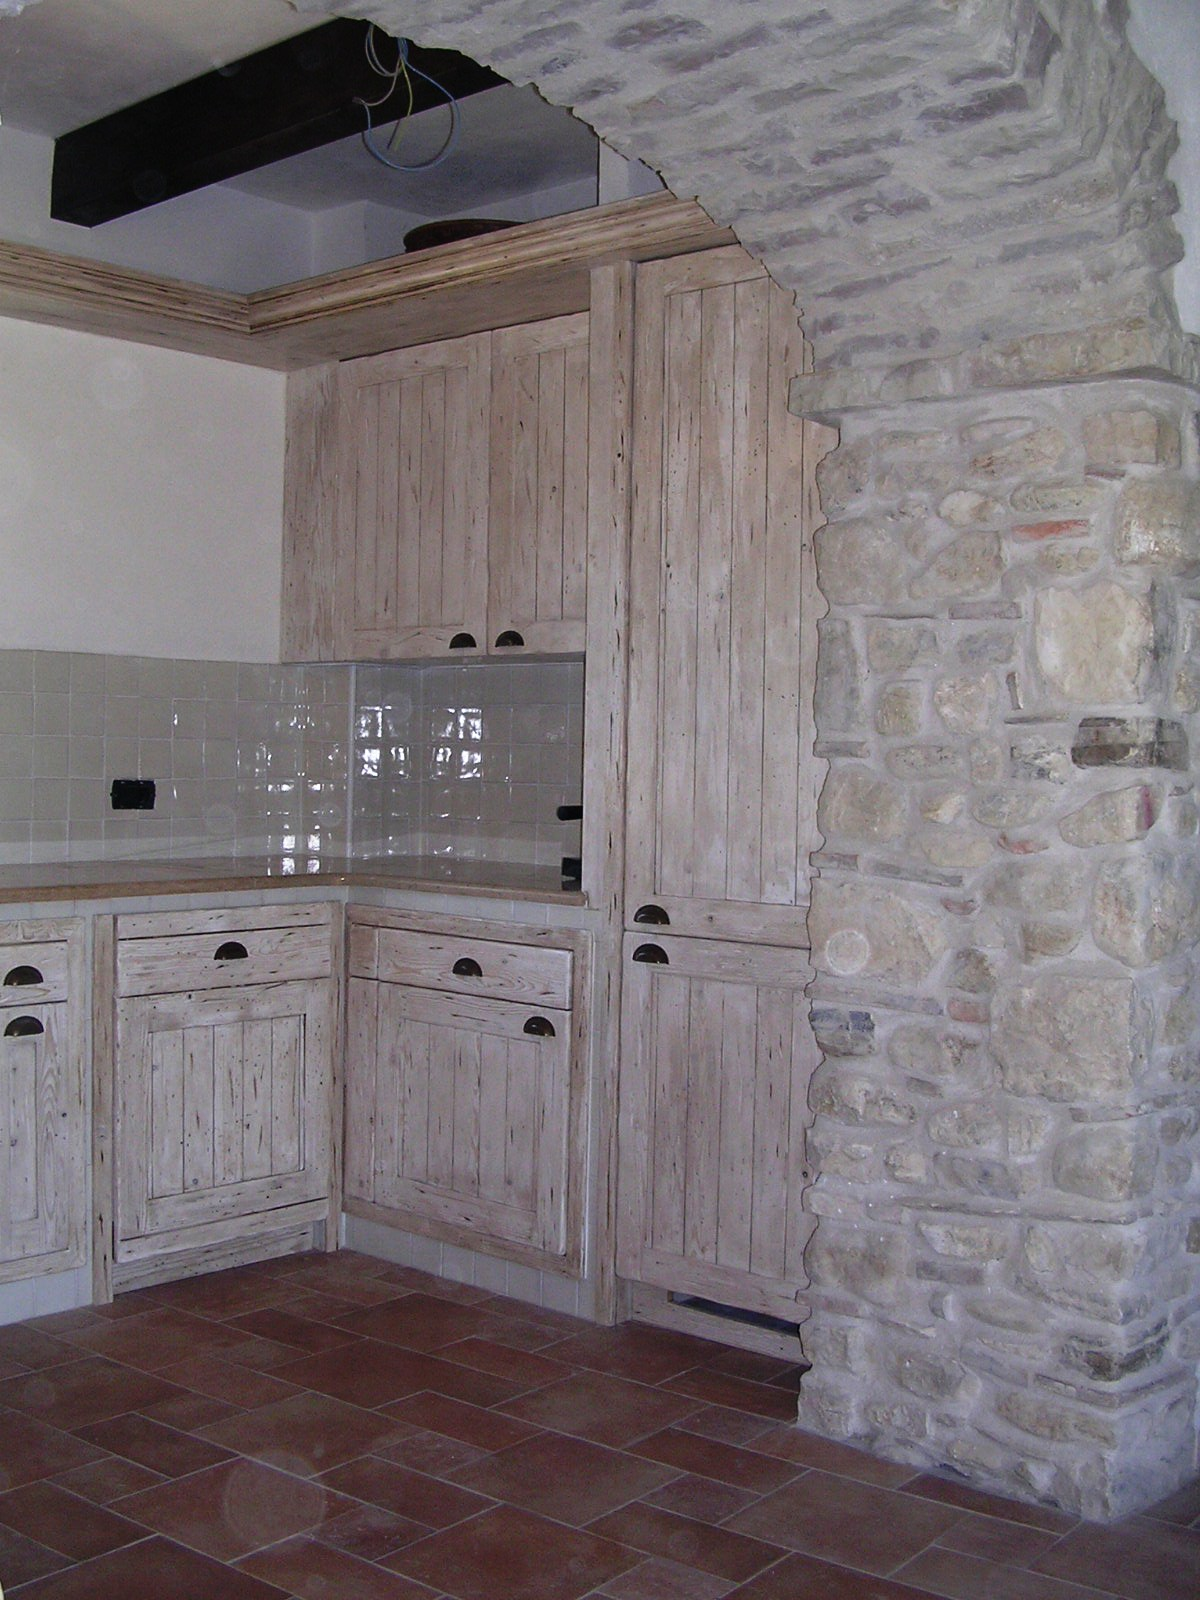 Cucine Componibili E In Muratura.Cucine In Muratura E Componibili Rd Arredamenti